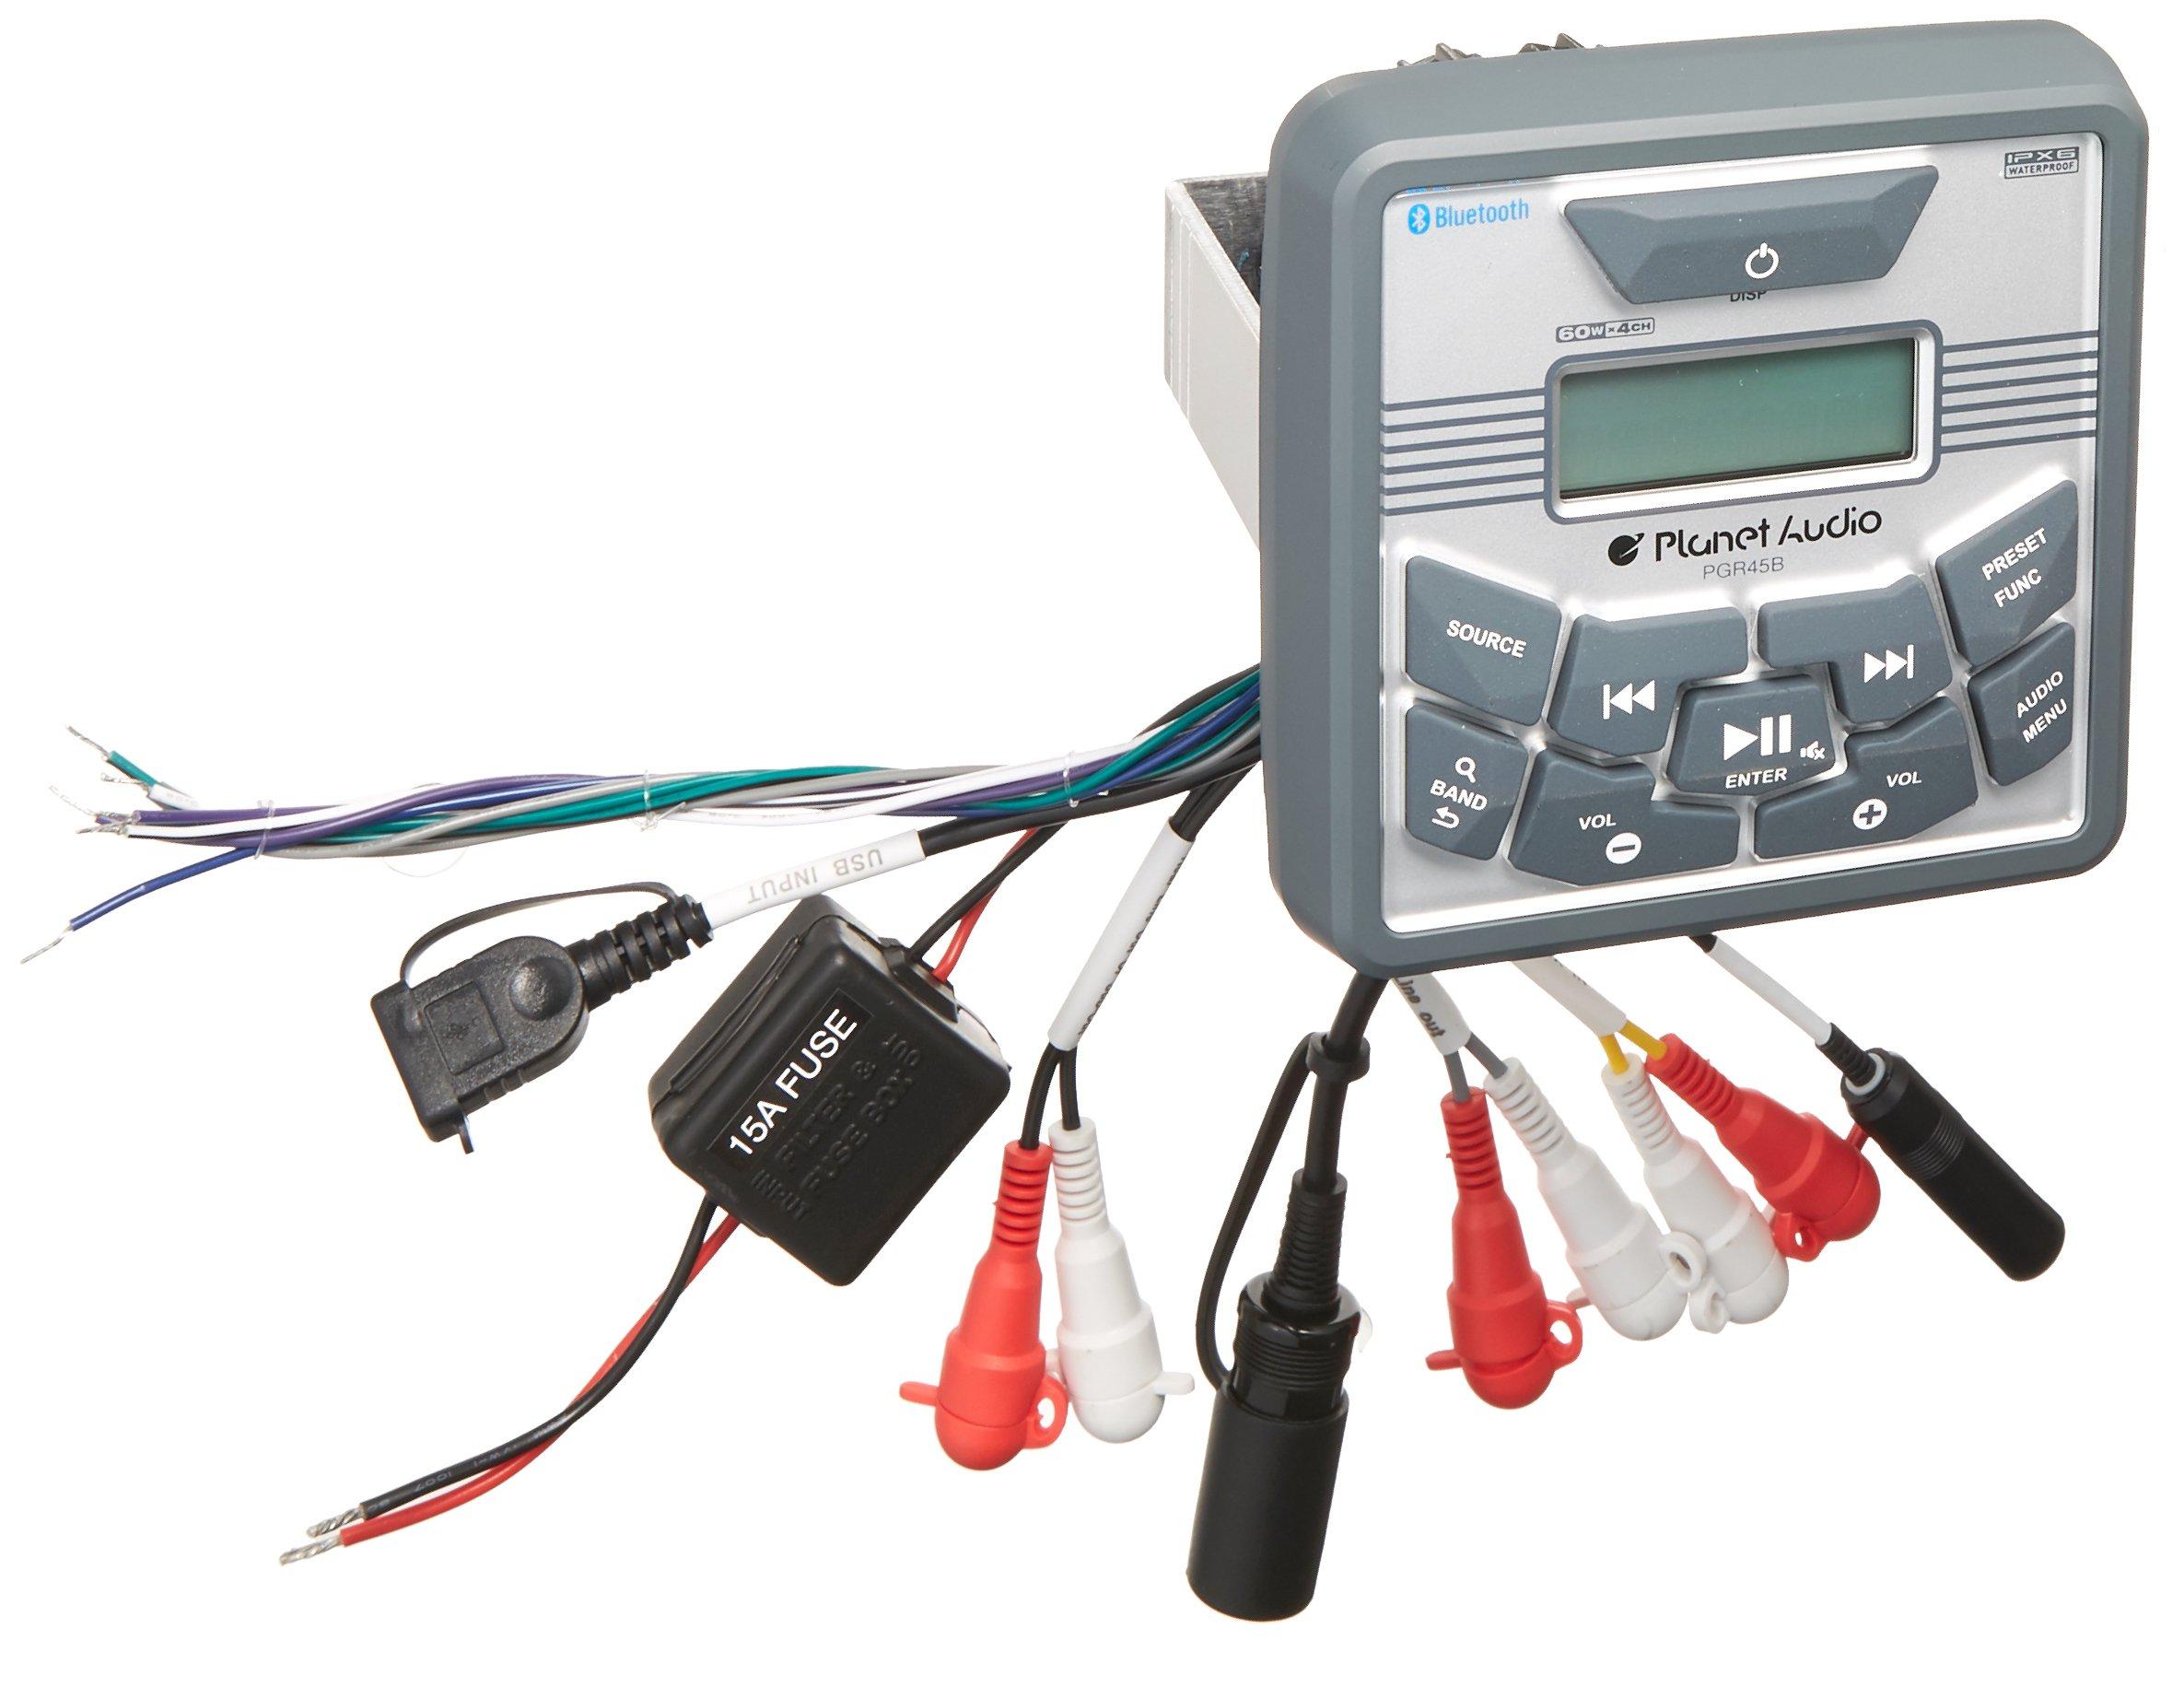 Planet Audio PGR45B Marine Receiver - Bluetooth, Marine Grade IPX6 Waterproof, MP3 USB Digital Media Player, Nod CD DVD, AM FM Radio, Built-in 4 Channel Amplifier